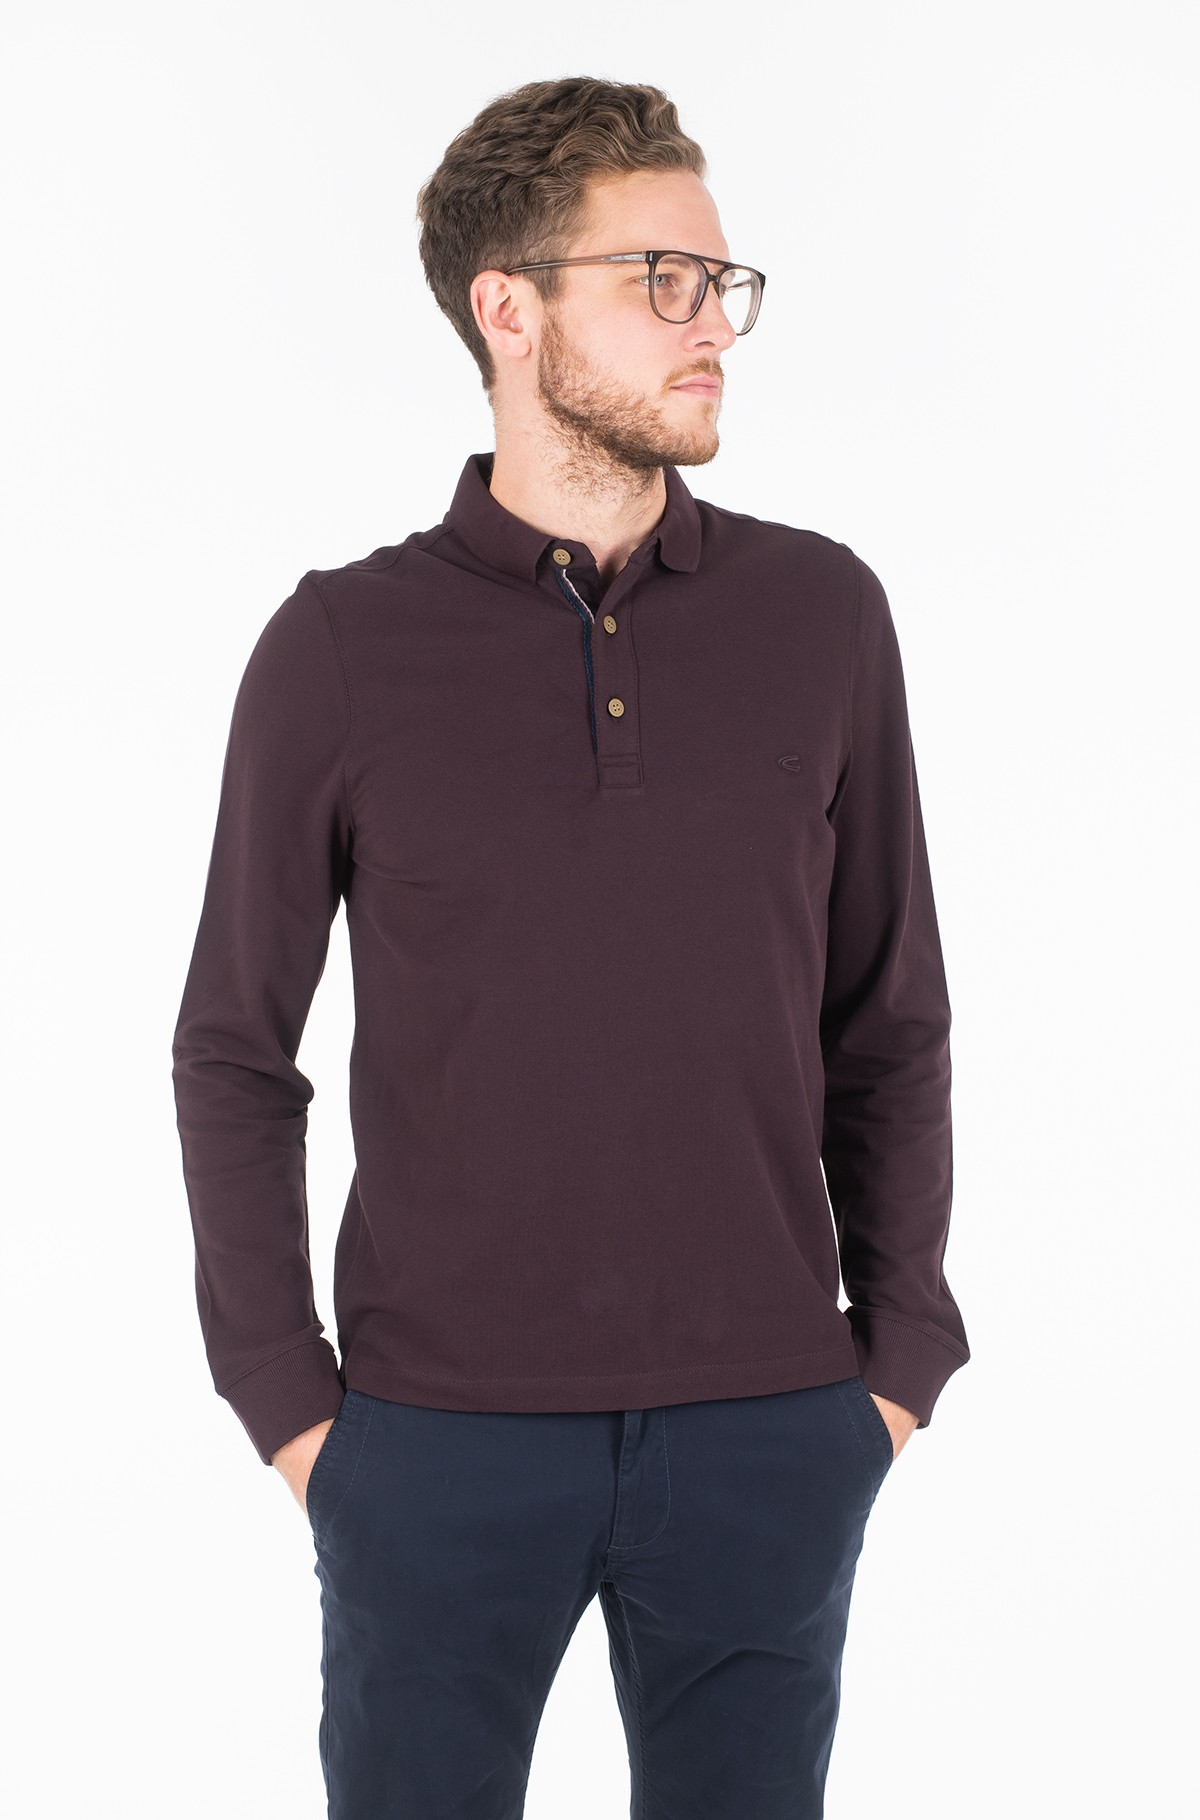 Polo marškinėliai ilgomis rankovėmis 31.128086-full-1